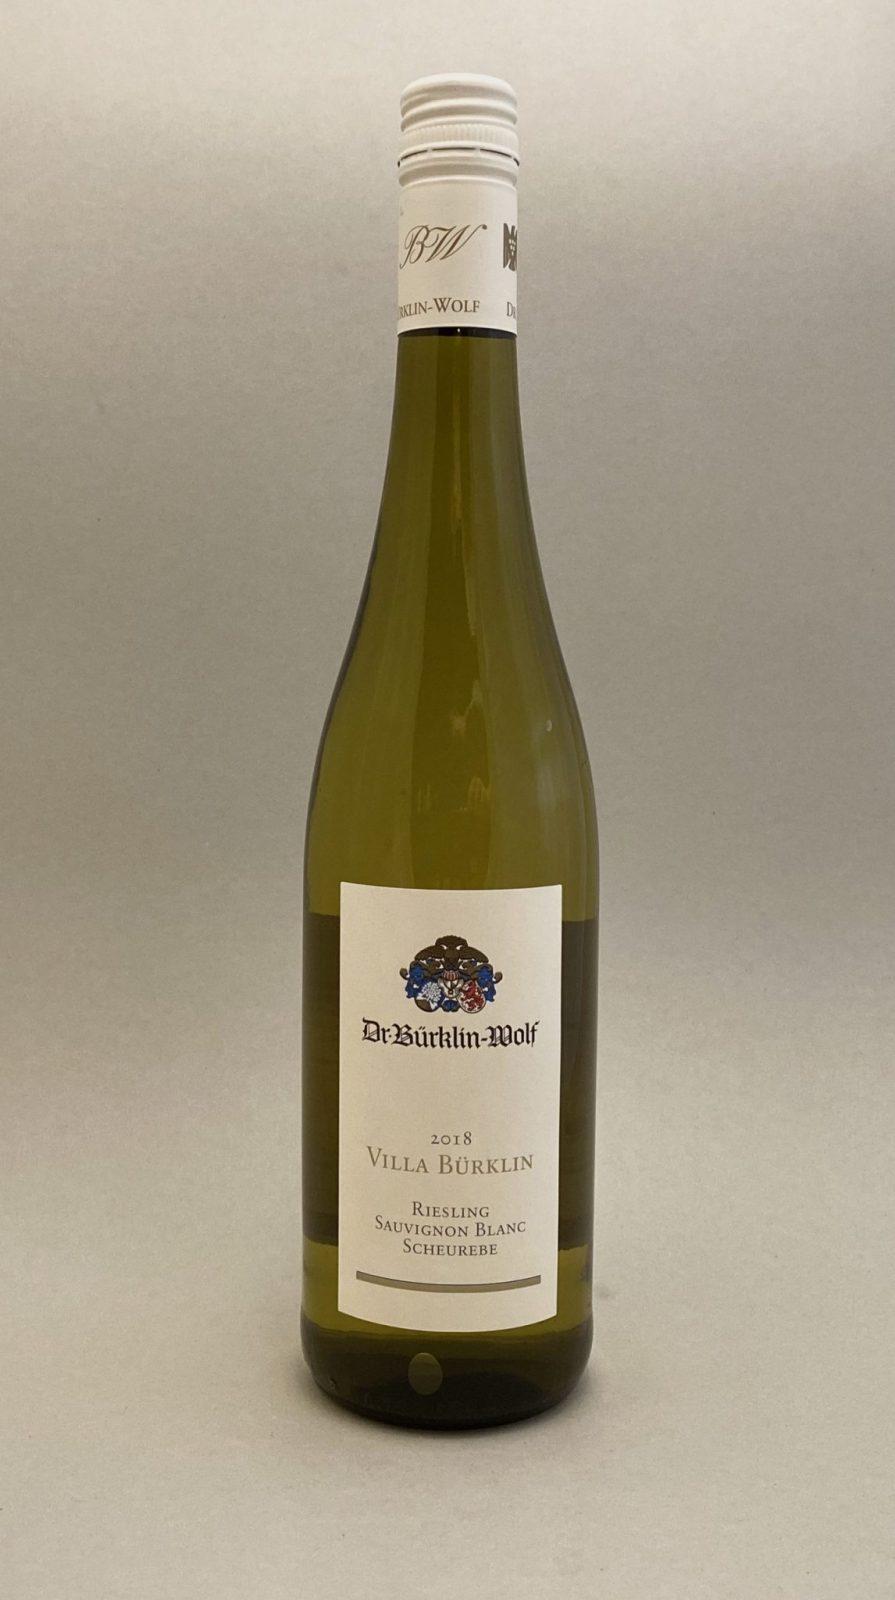 Dr. BURKLIN WOLF Villa Burklin 2018, vinoteka Bratislava Sunny wines slnecnice mesto, petrzalka, vino biele z Nemecka